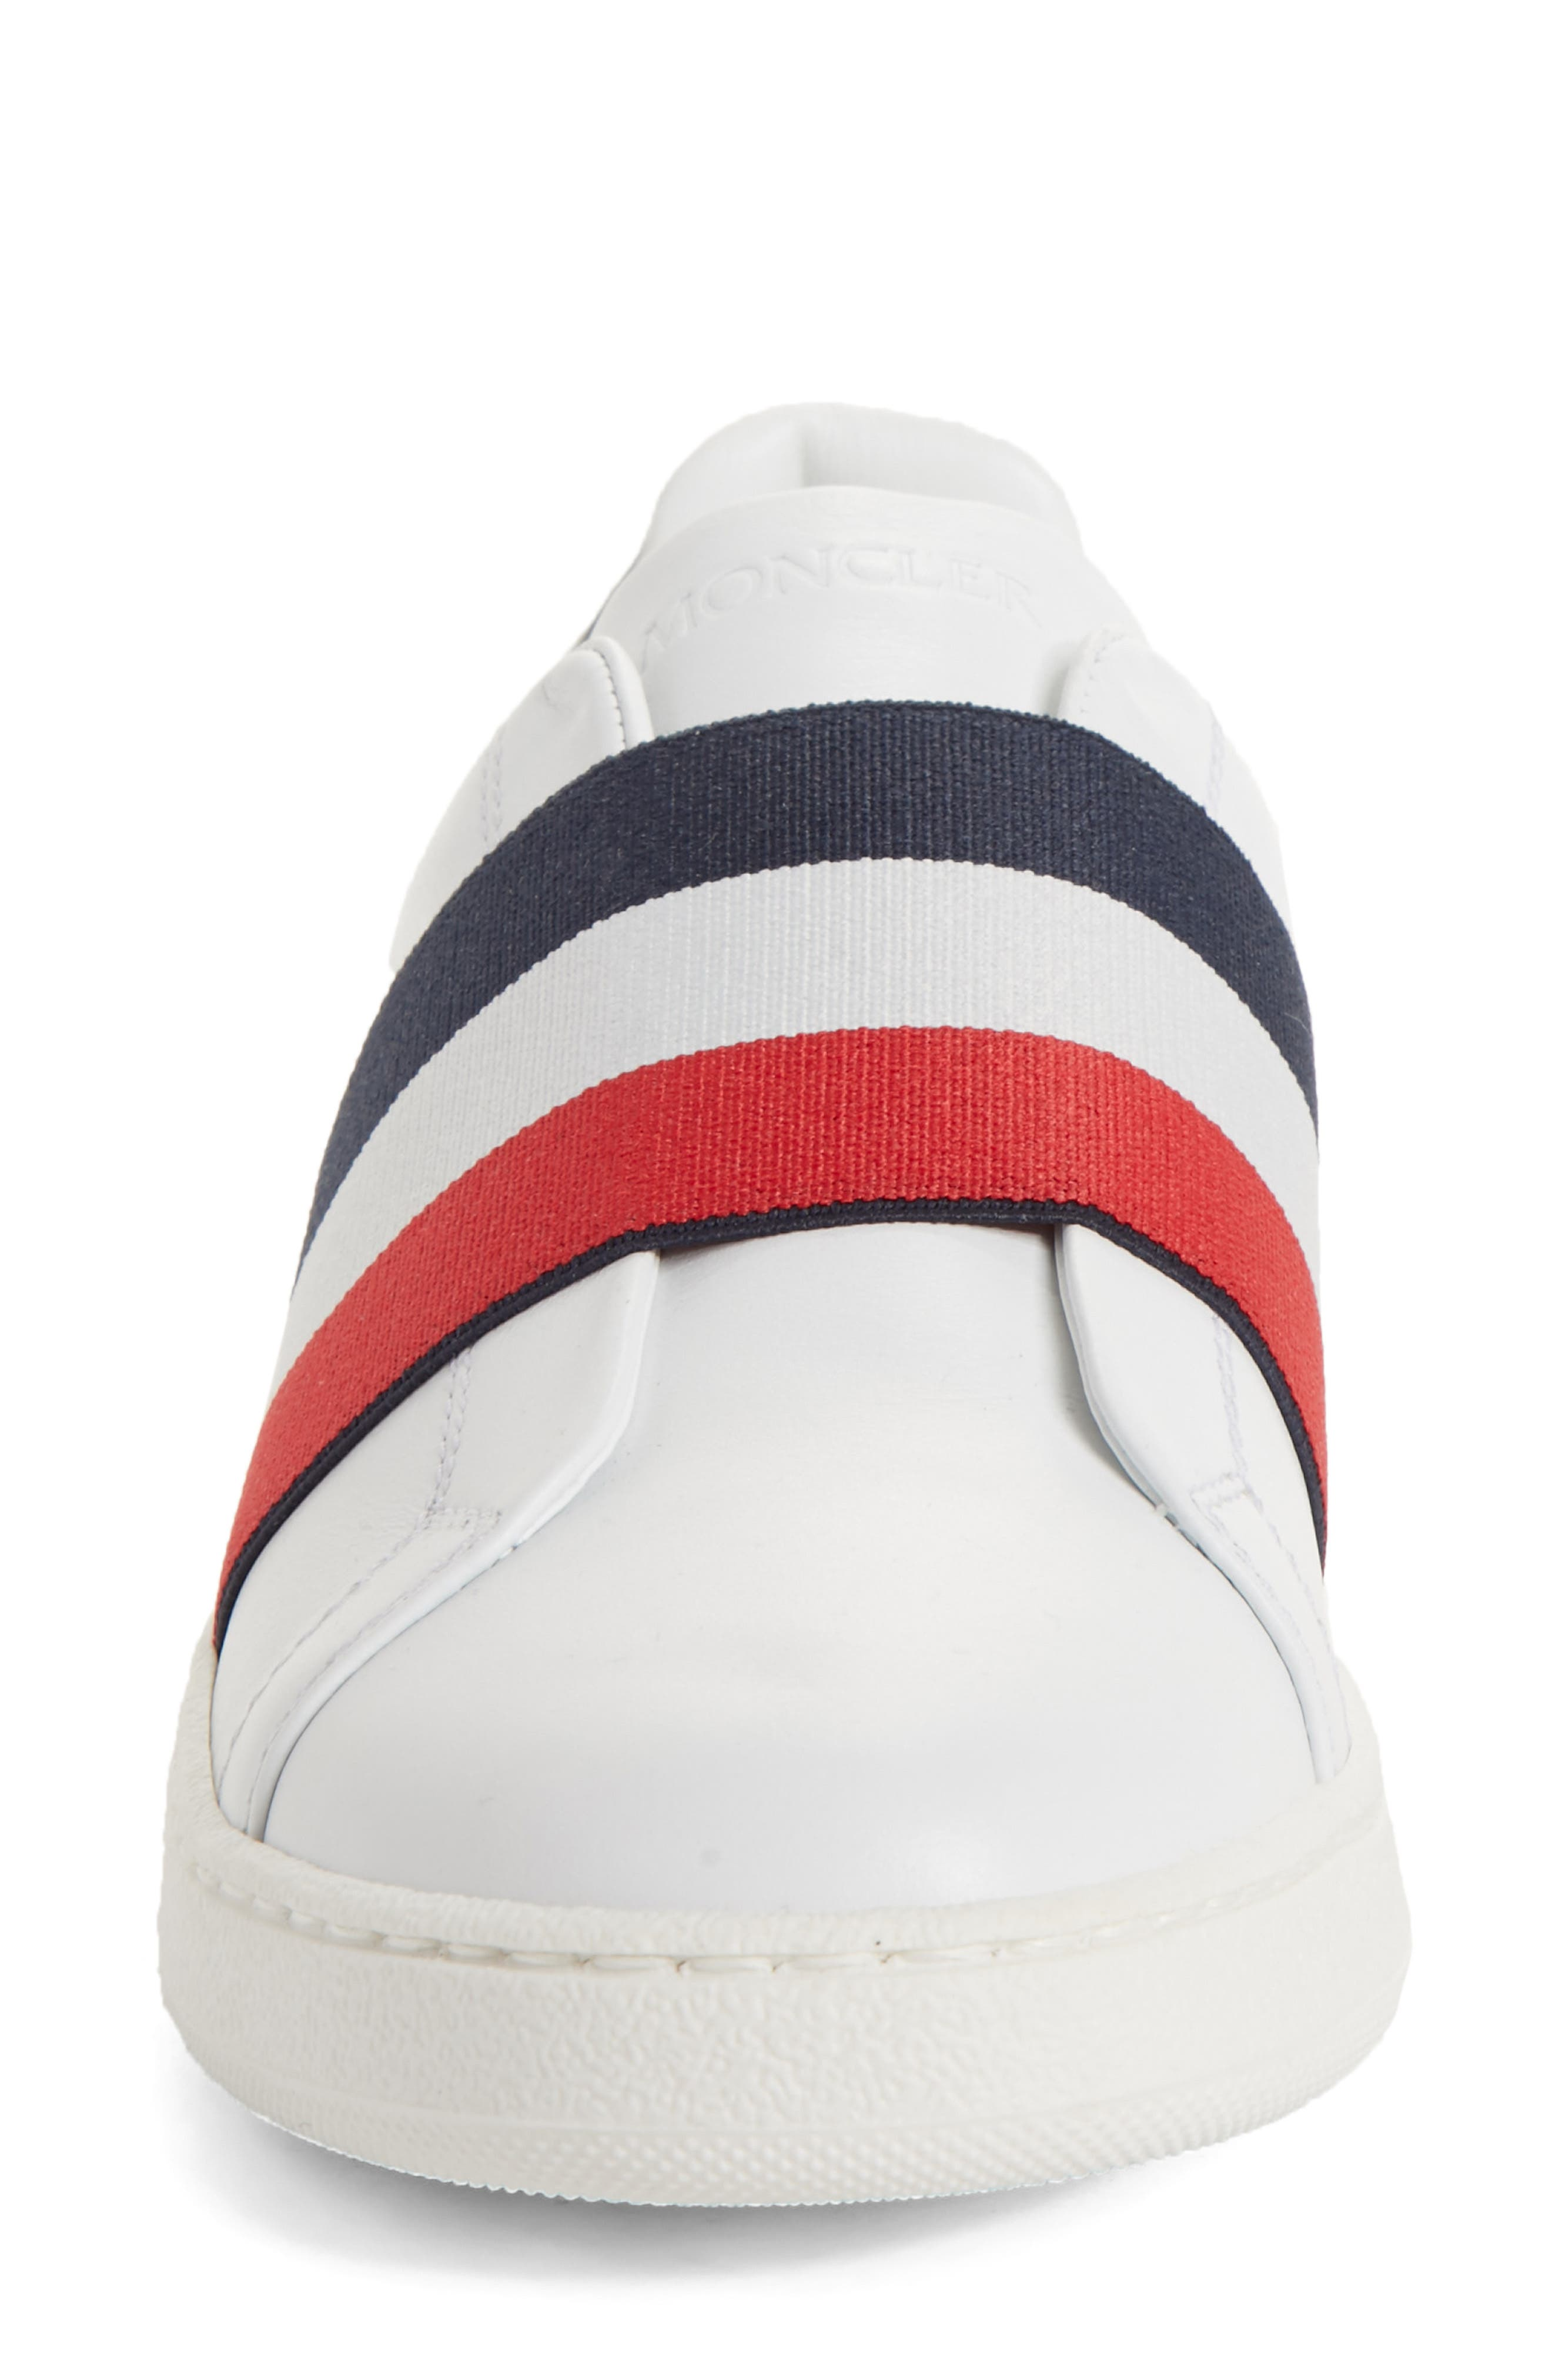 Alizee Low Top Sneaker,                             Alternate thumbnail 4, color,                             100